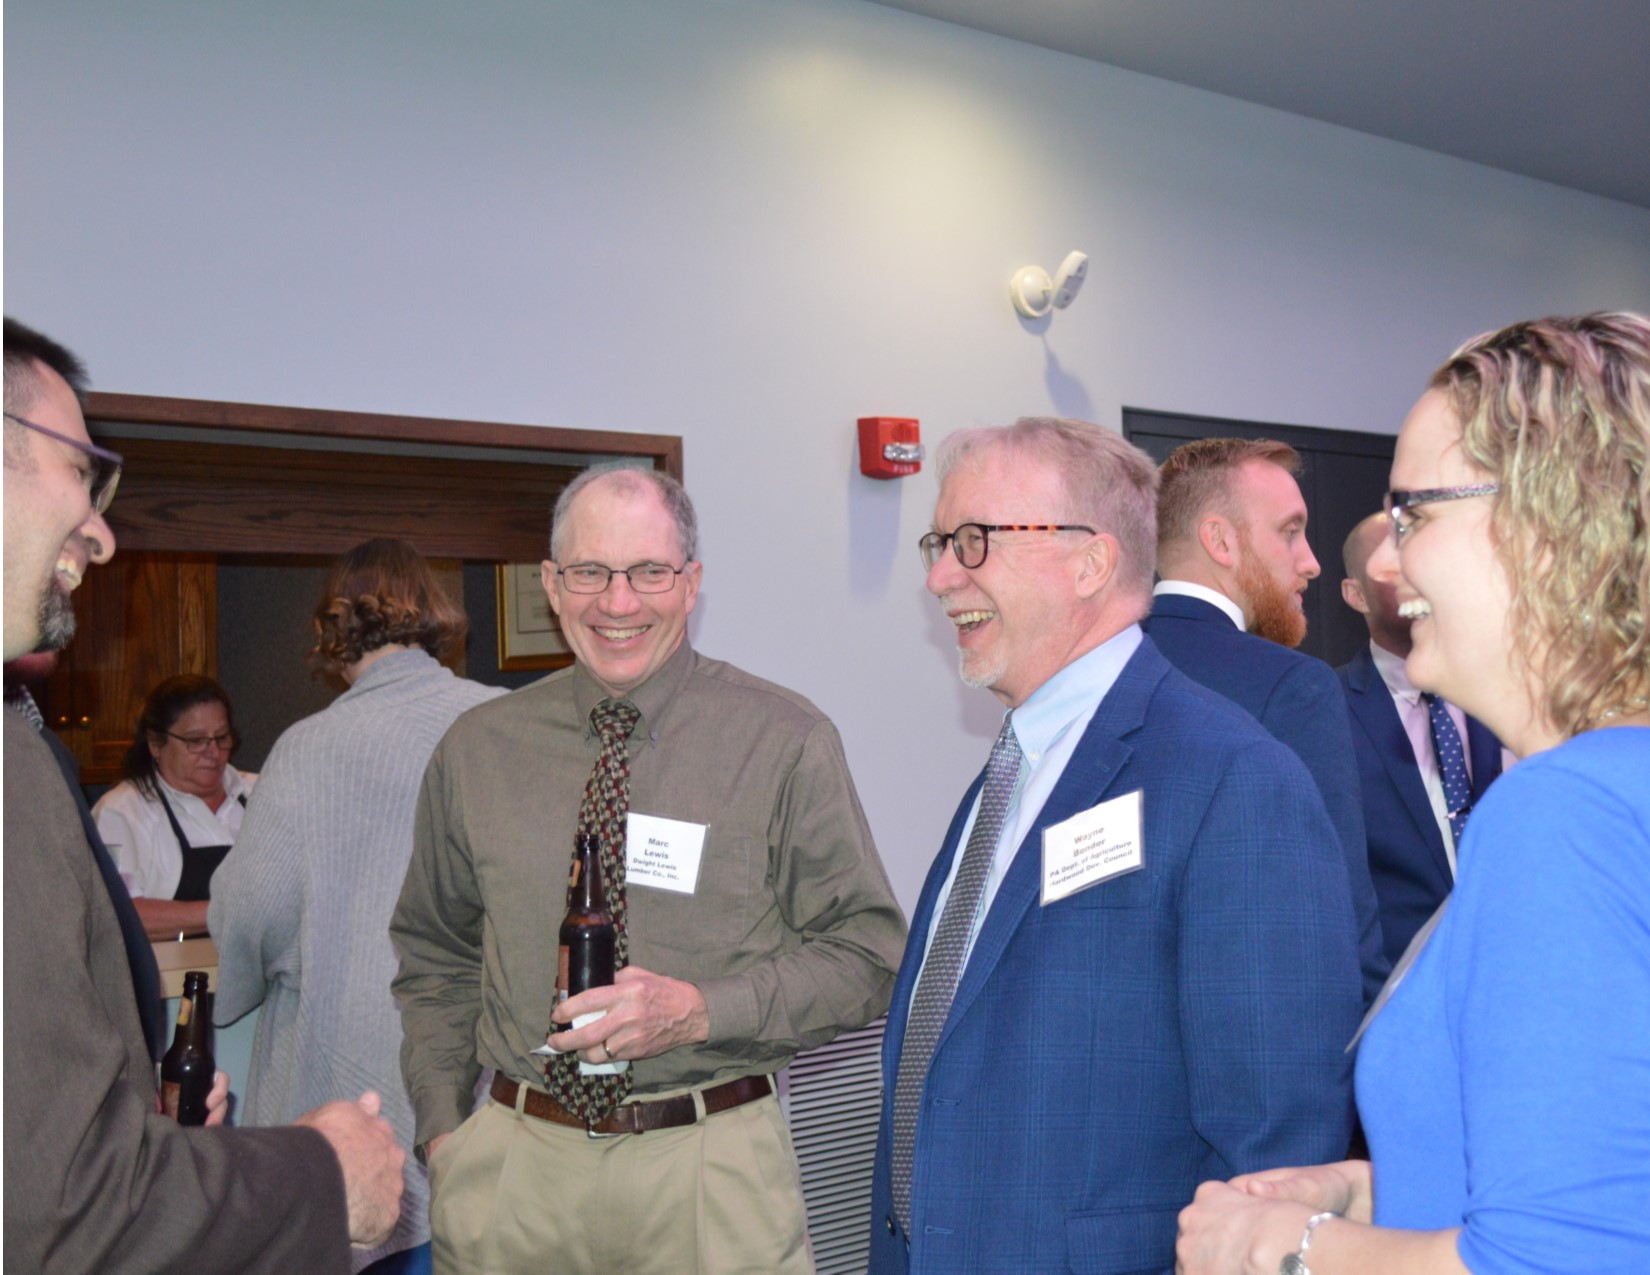 KWPA's Annual Meeting